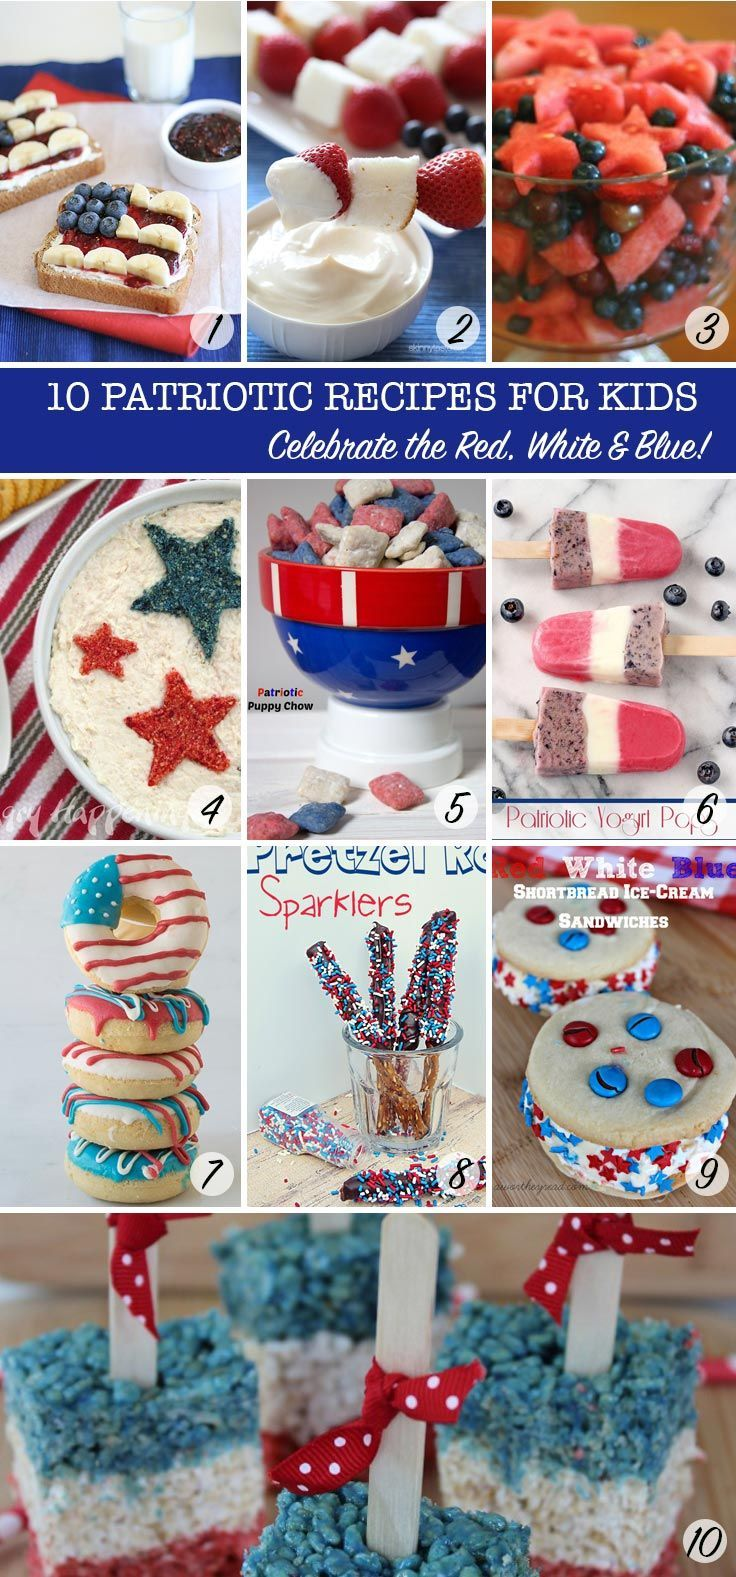 15 Fun 4th of July Party Ideas Thatll Impress Guests 15 Fun 4th of July Party Ideas Thatll Impress Guests new pics